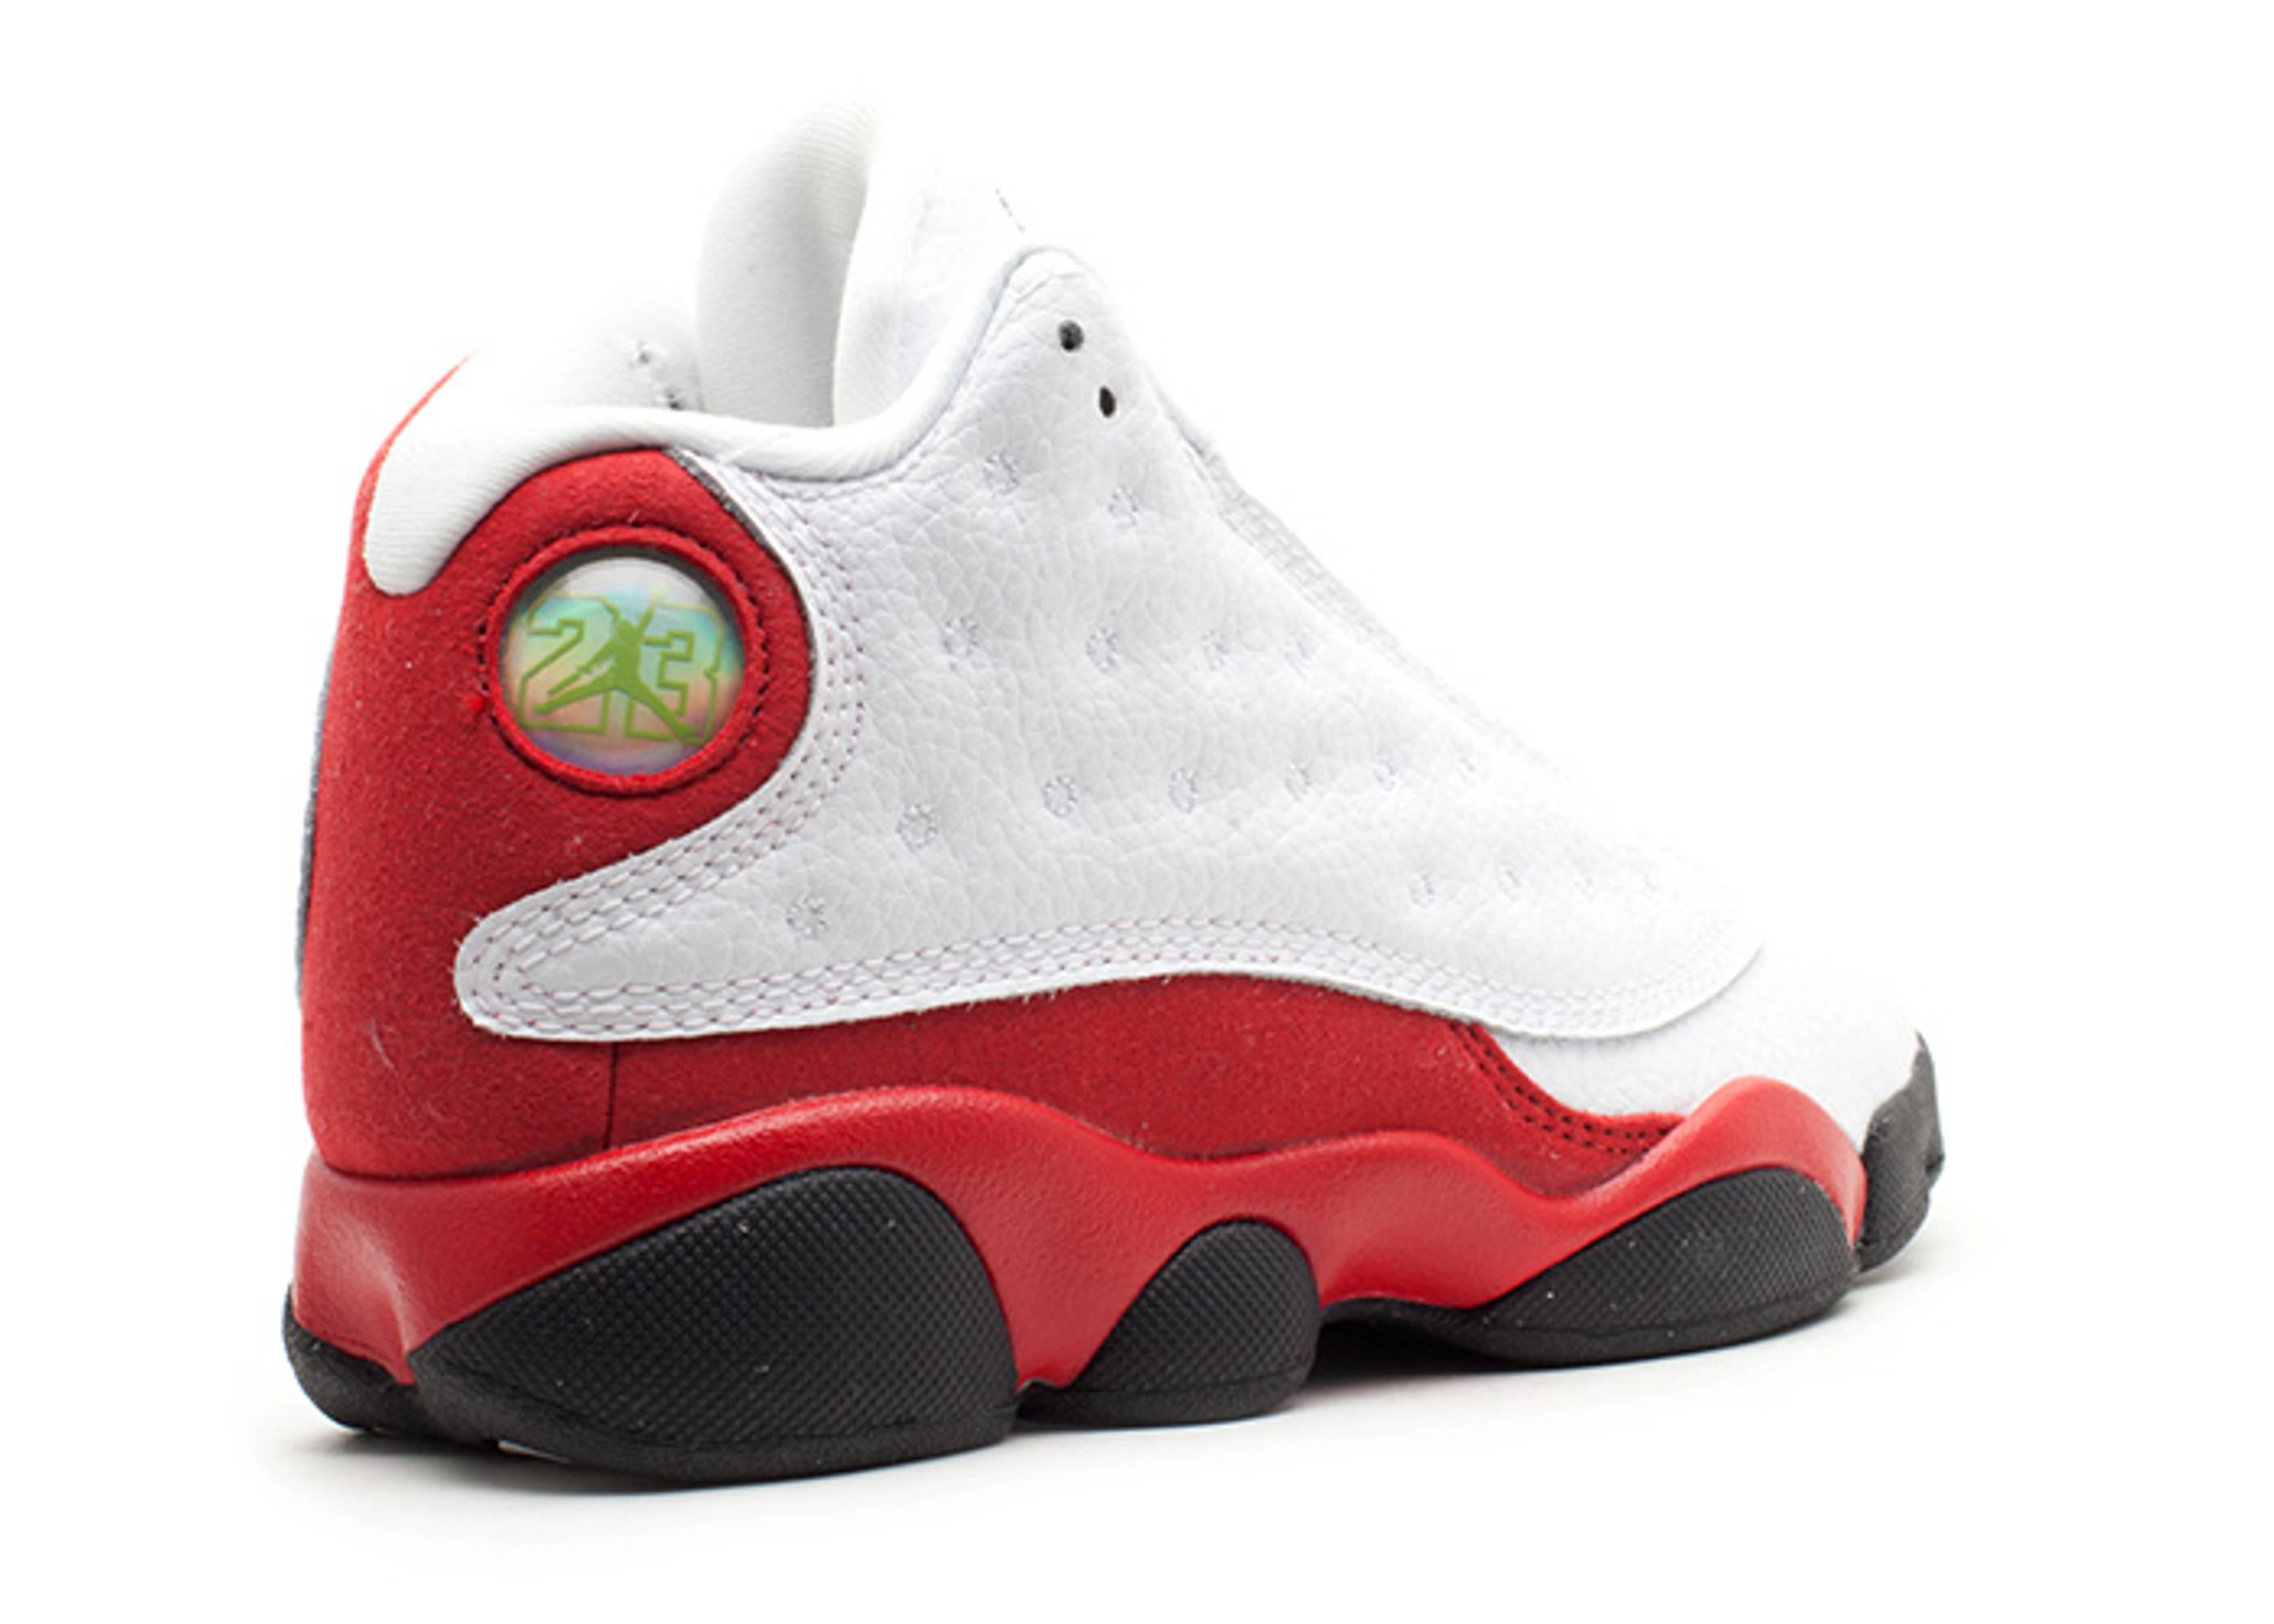 ed8cbf9372661b Jordan 13 Retro (ps) - Air Jordan - 414575 101 - white black-varsity red